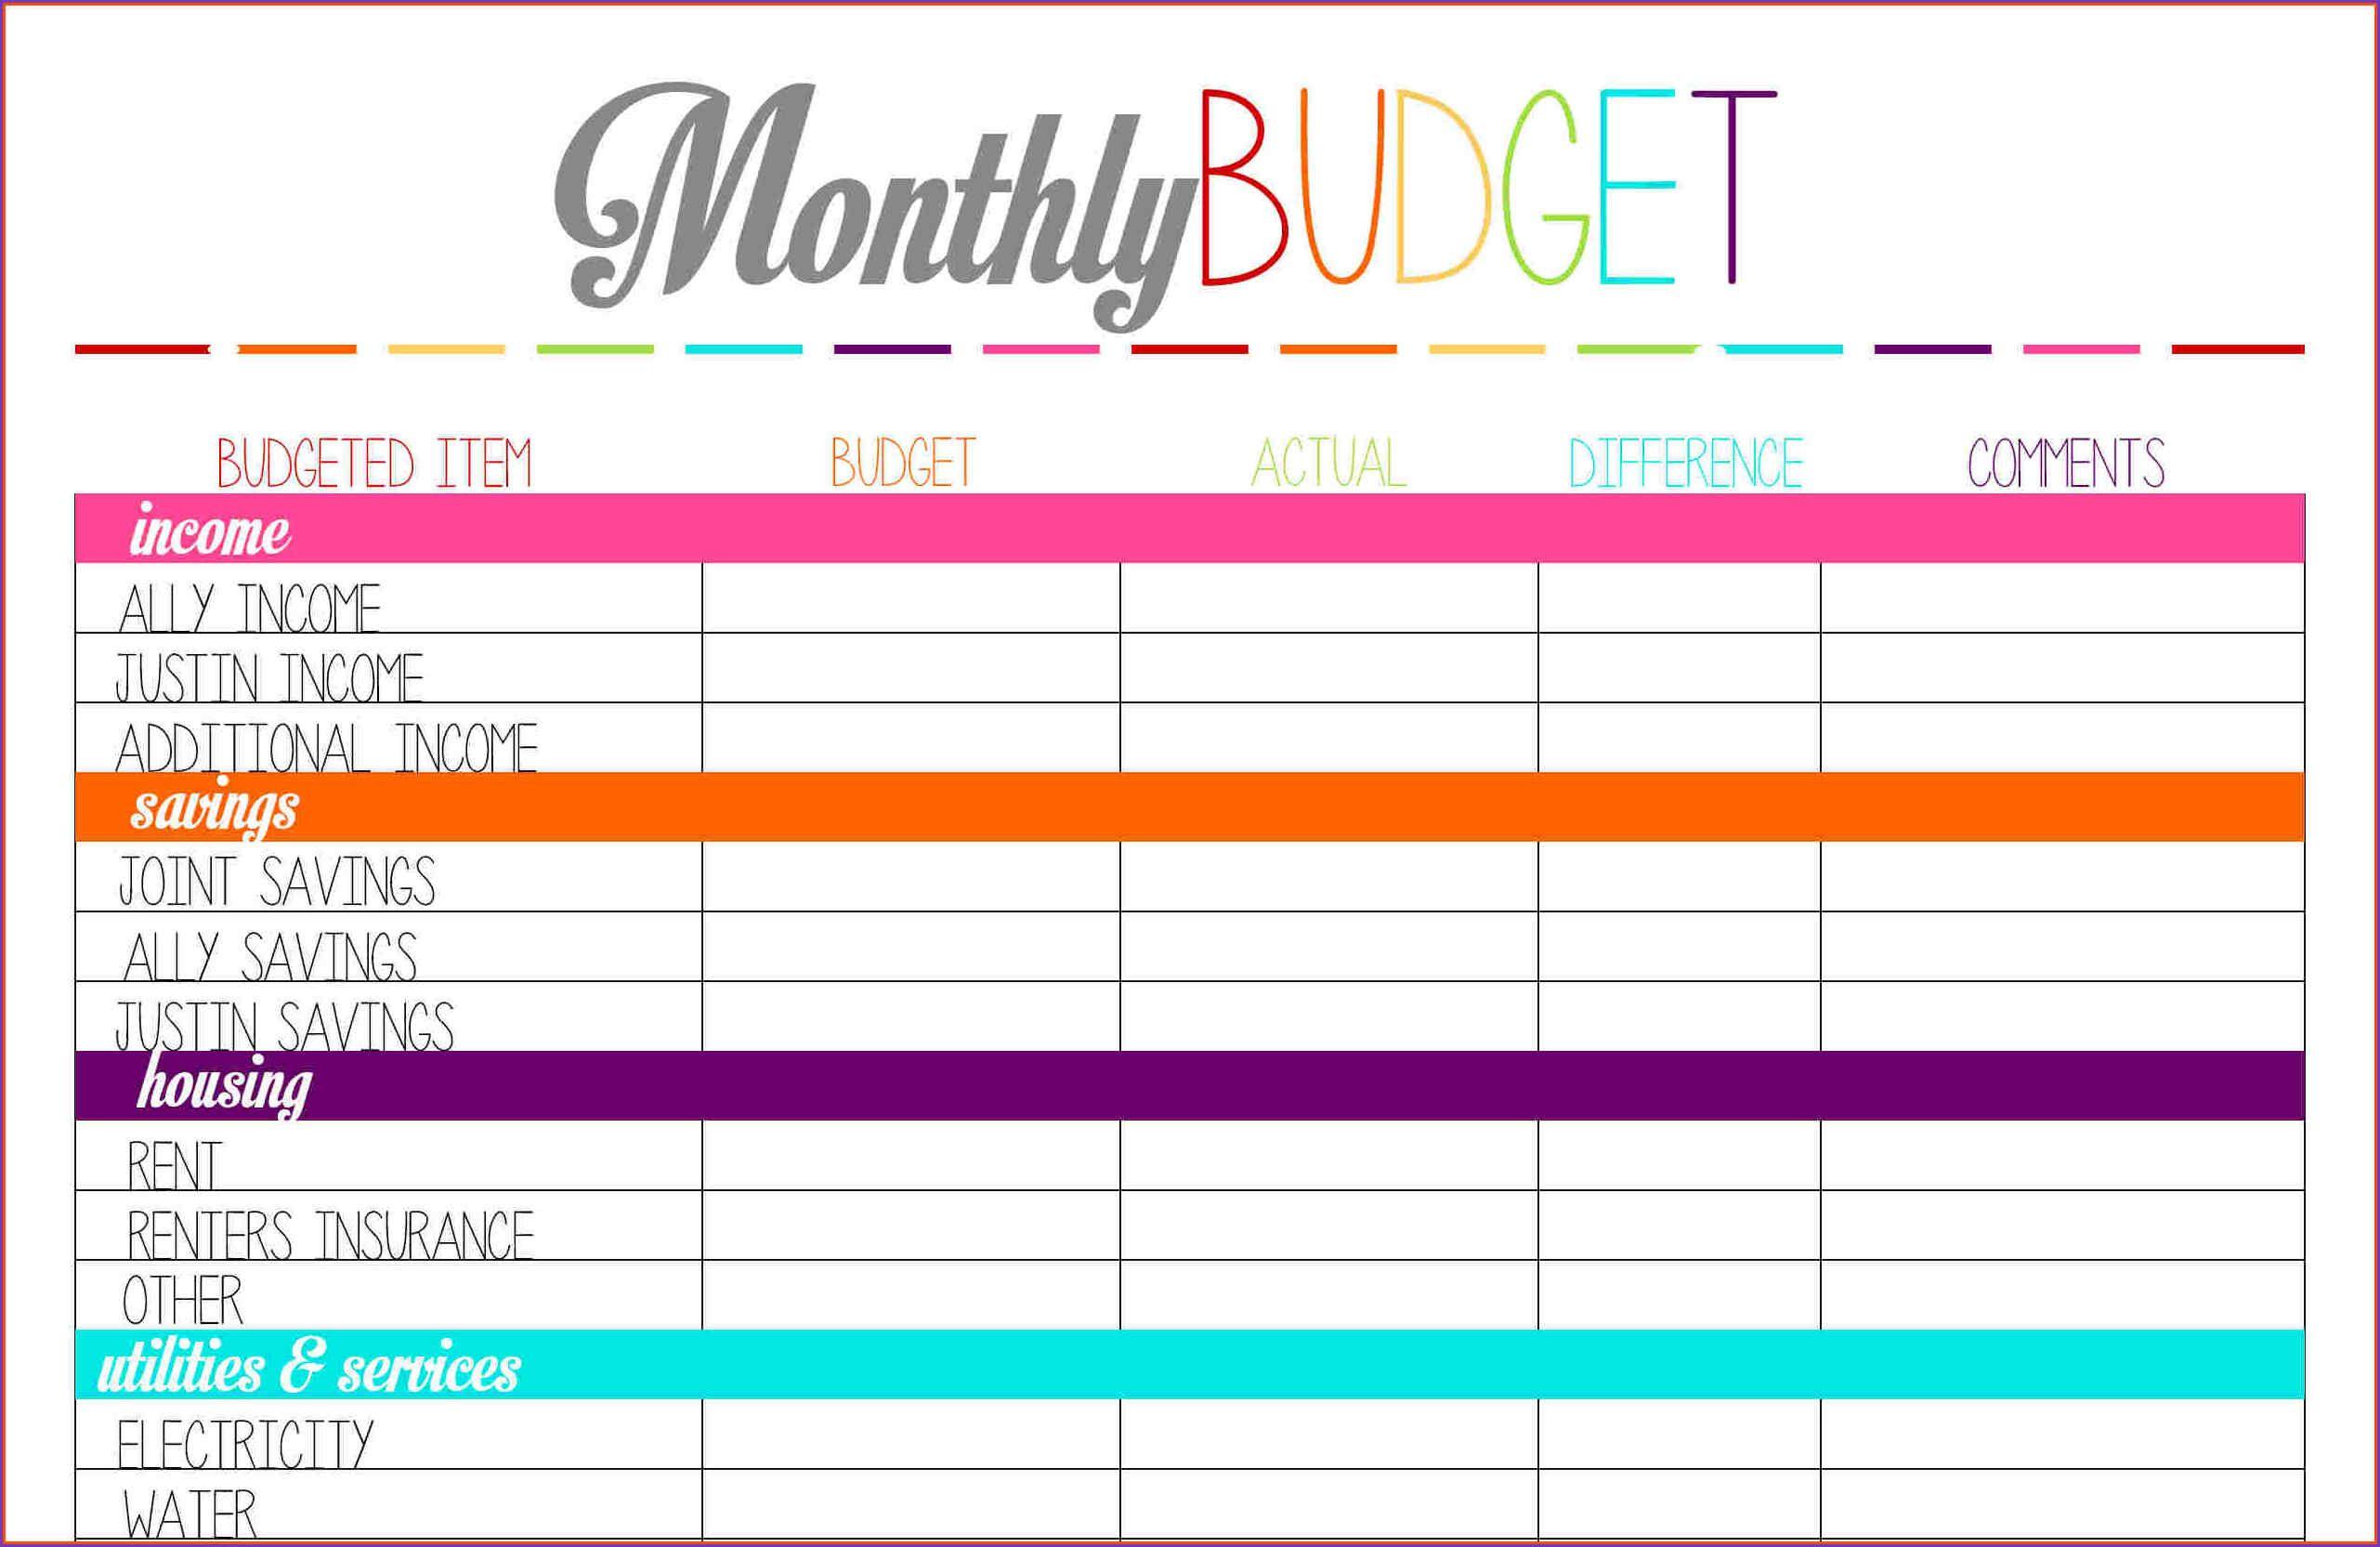 Monthly Budget Preadsheet Free Printable Worksheet Detailed Family - Free Printable Budget Planner Uk